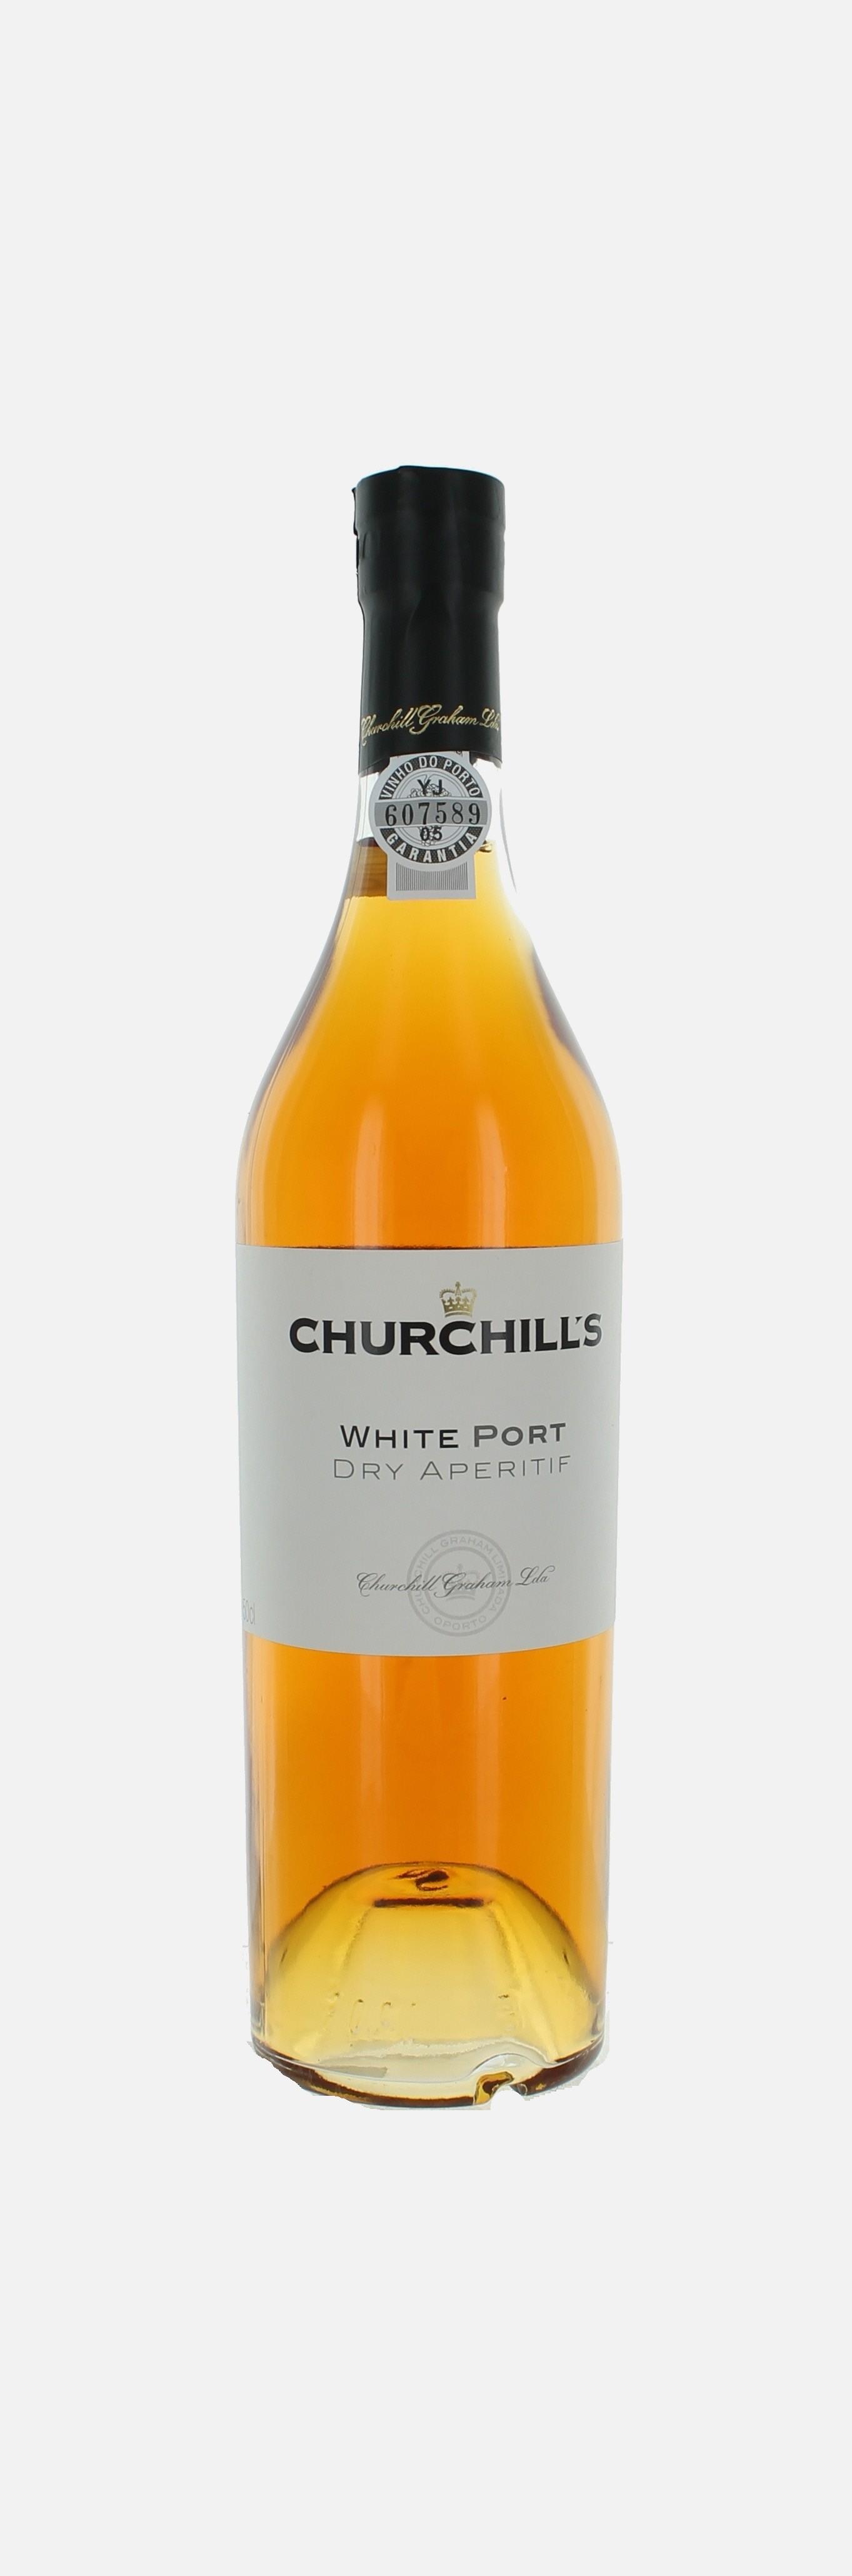 Churchills White Port Dry